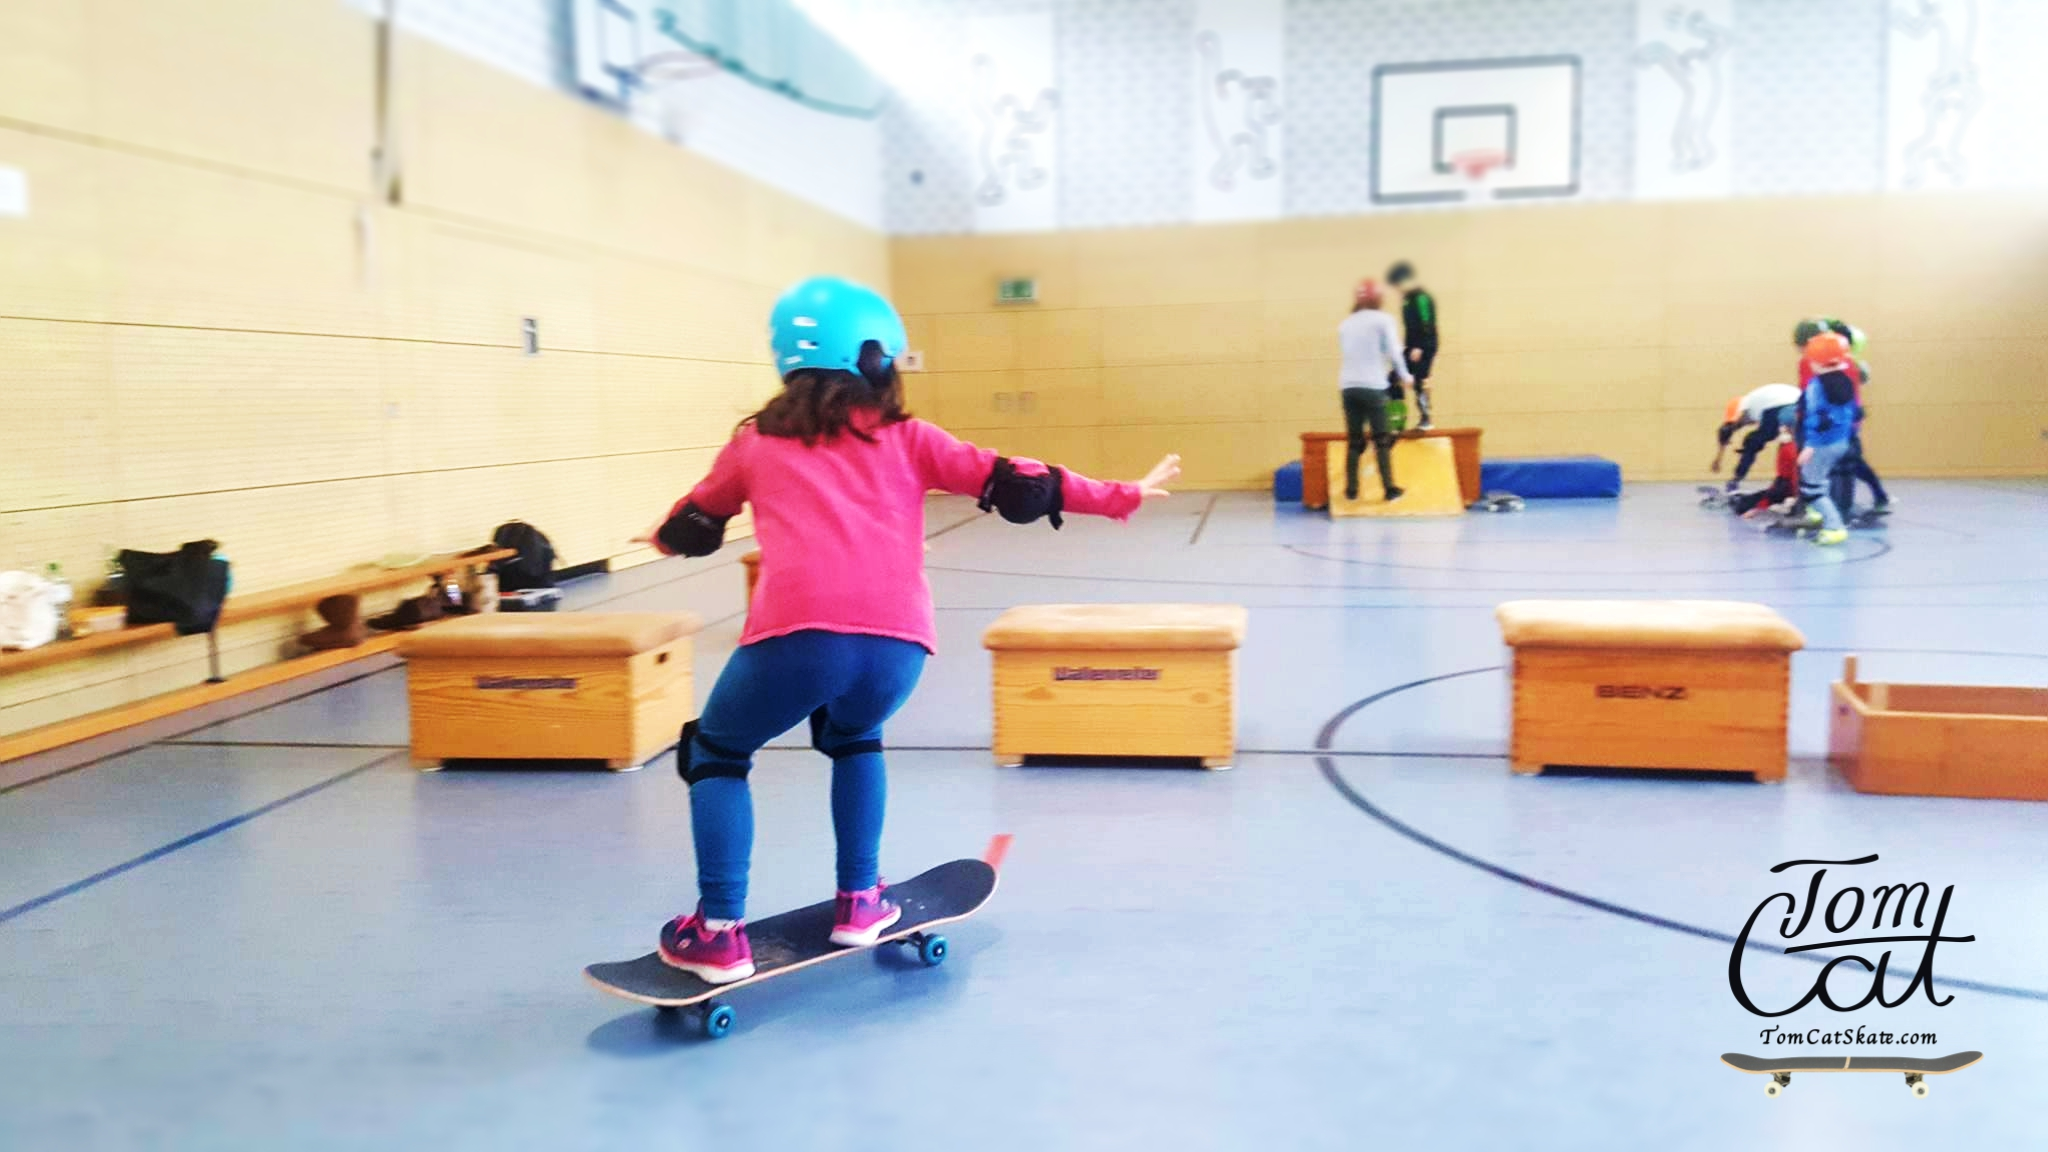 Skatekurse Landsberg München Tom Cat Skateboard fahren lernen tomcatskate.comSkatekurs München.jpg